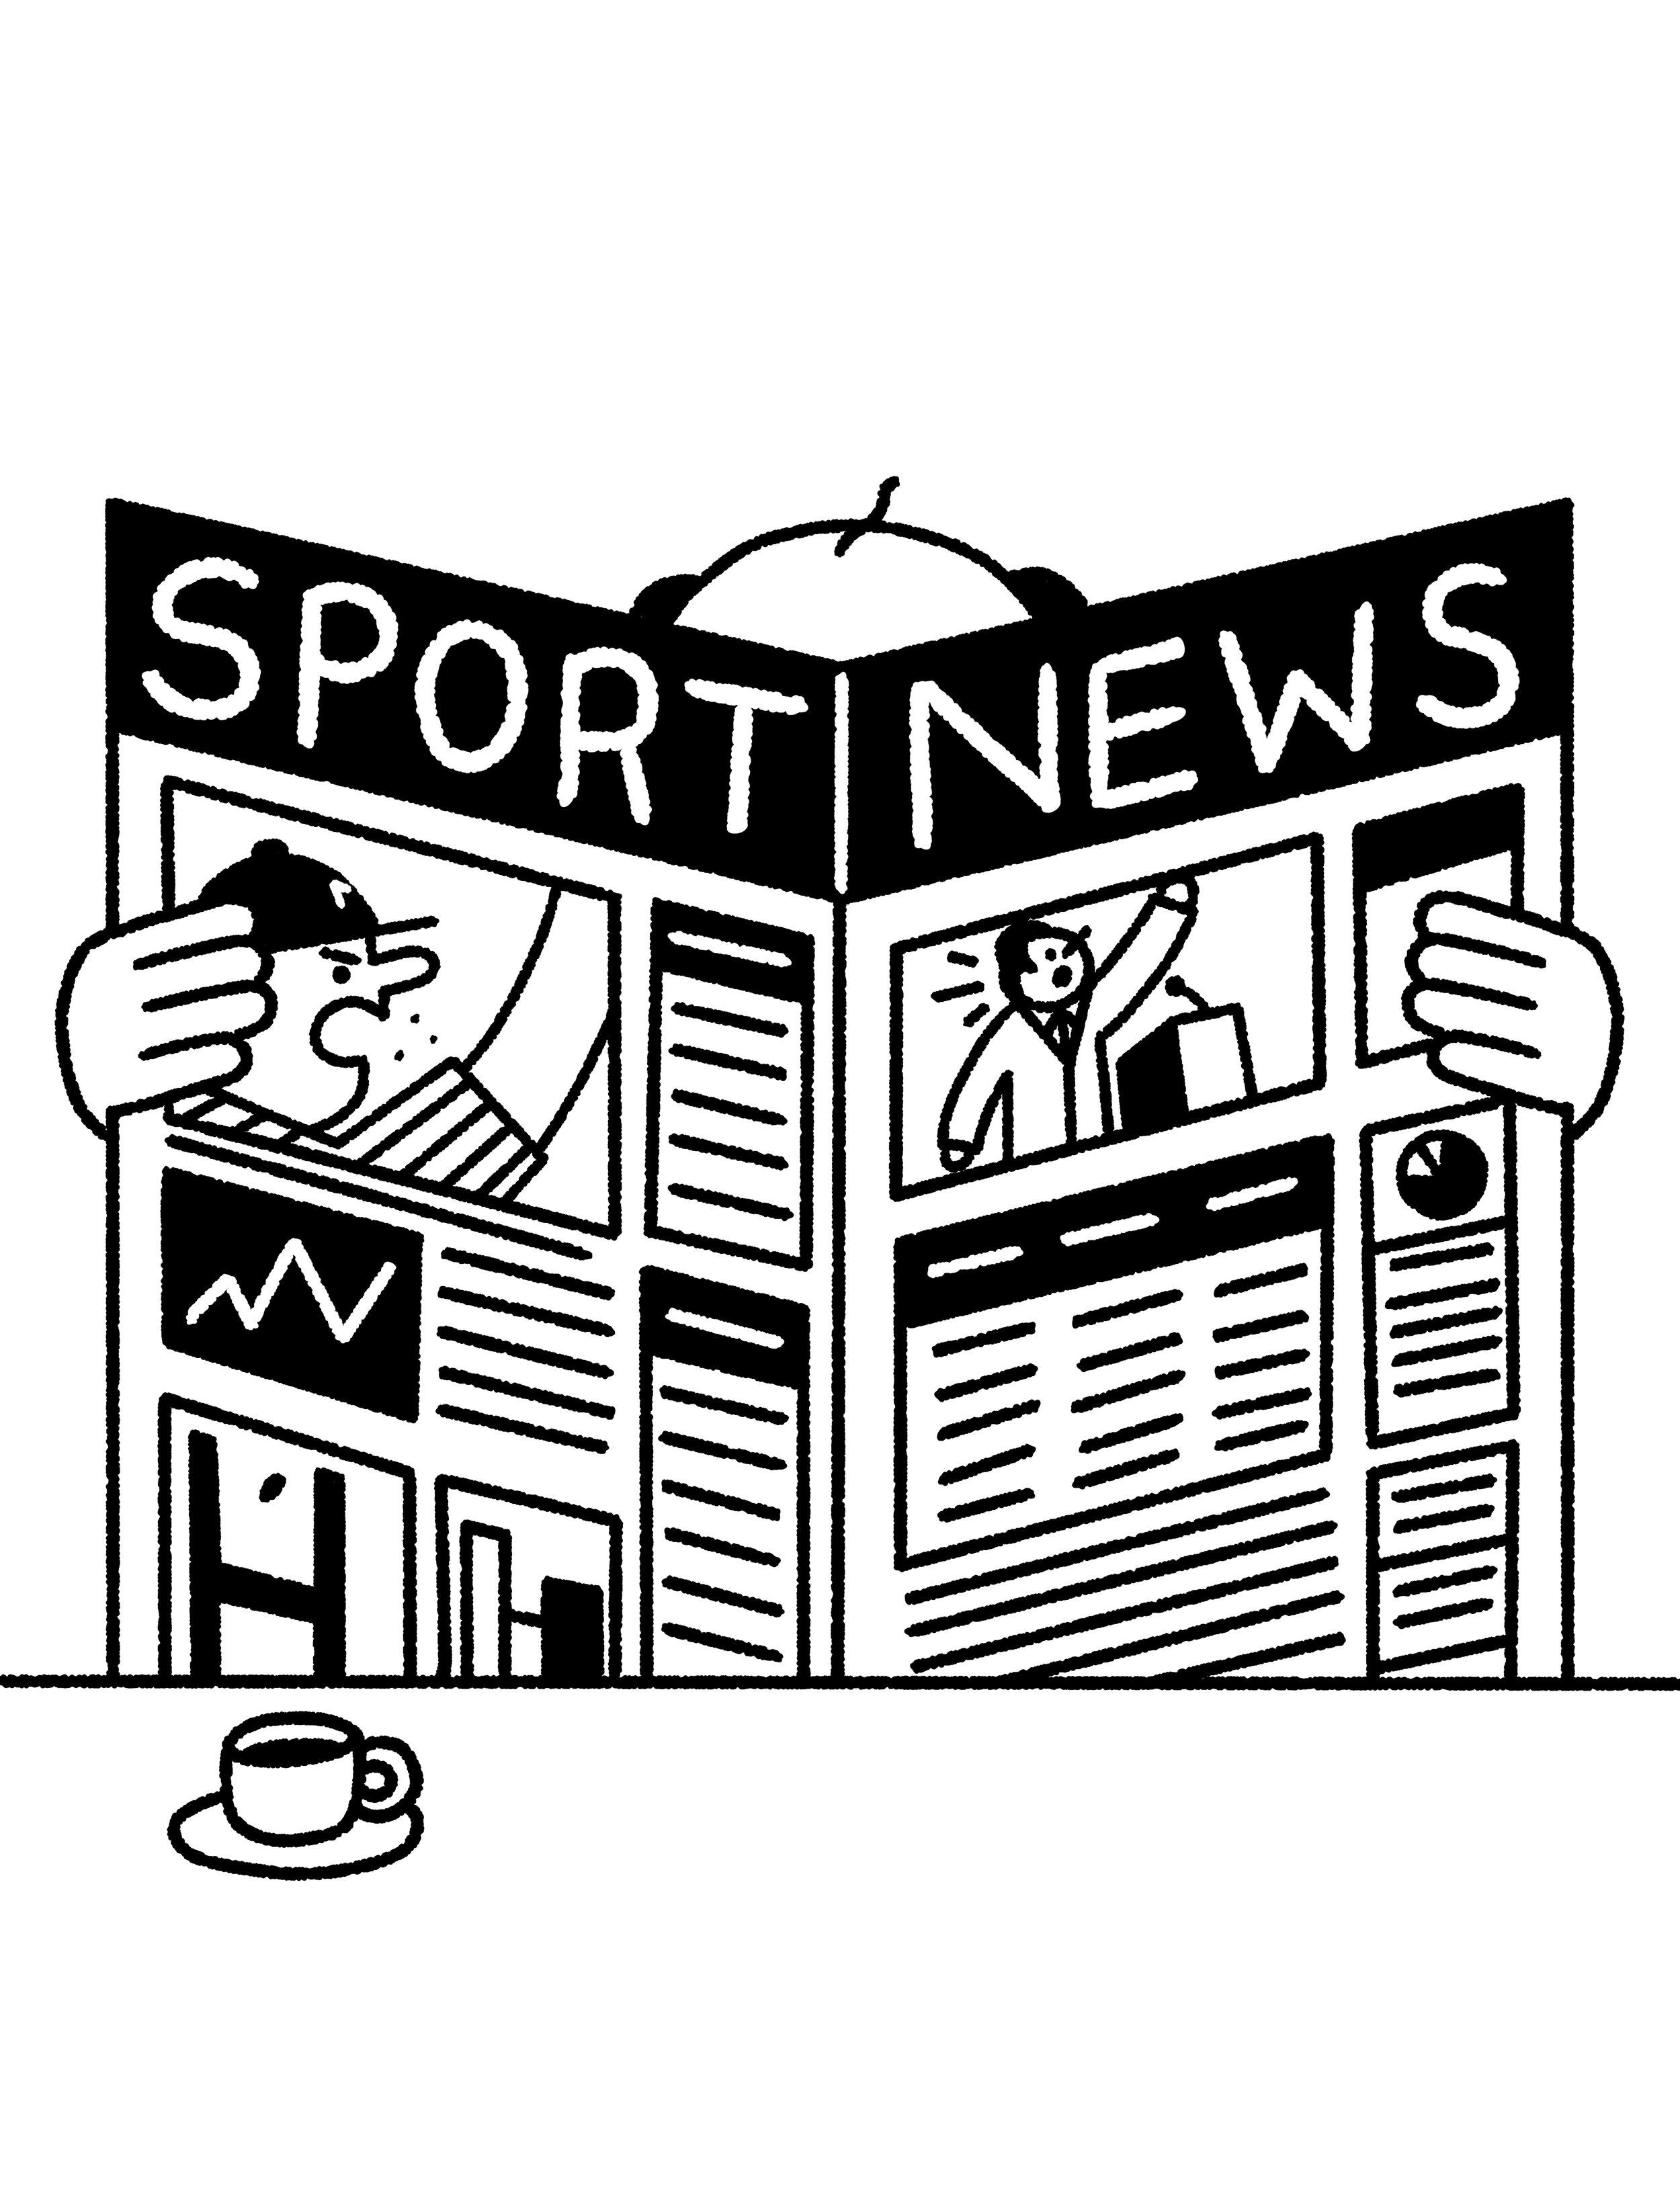 NY NEWSPAPER final.jpg